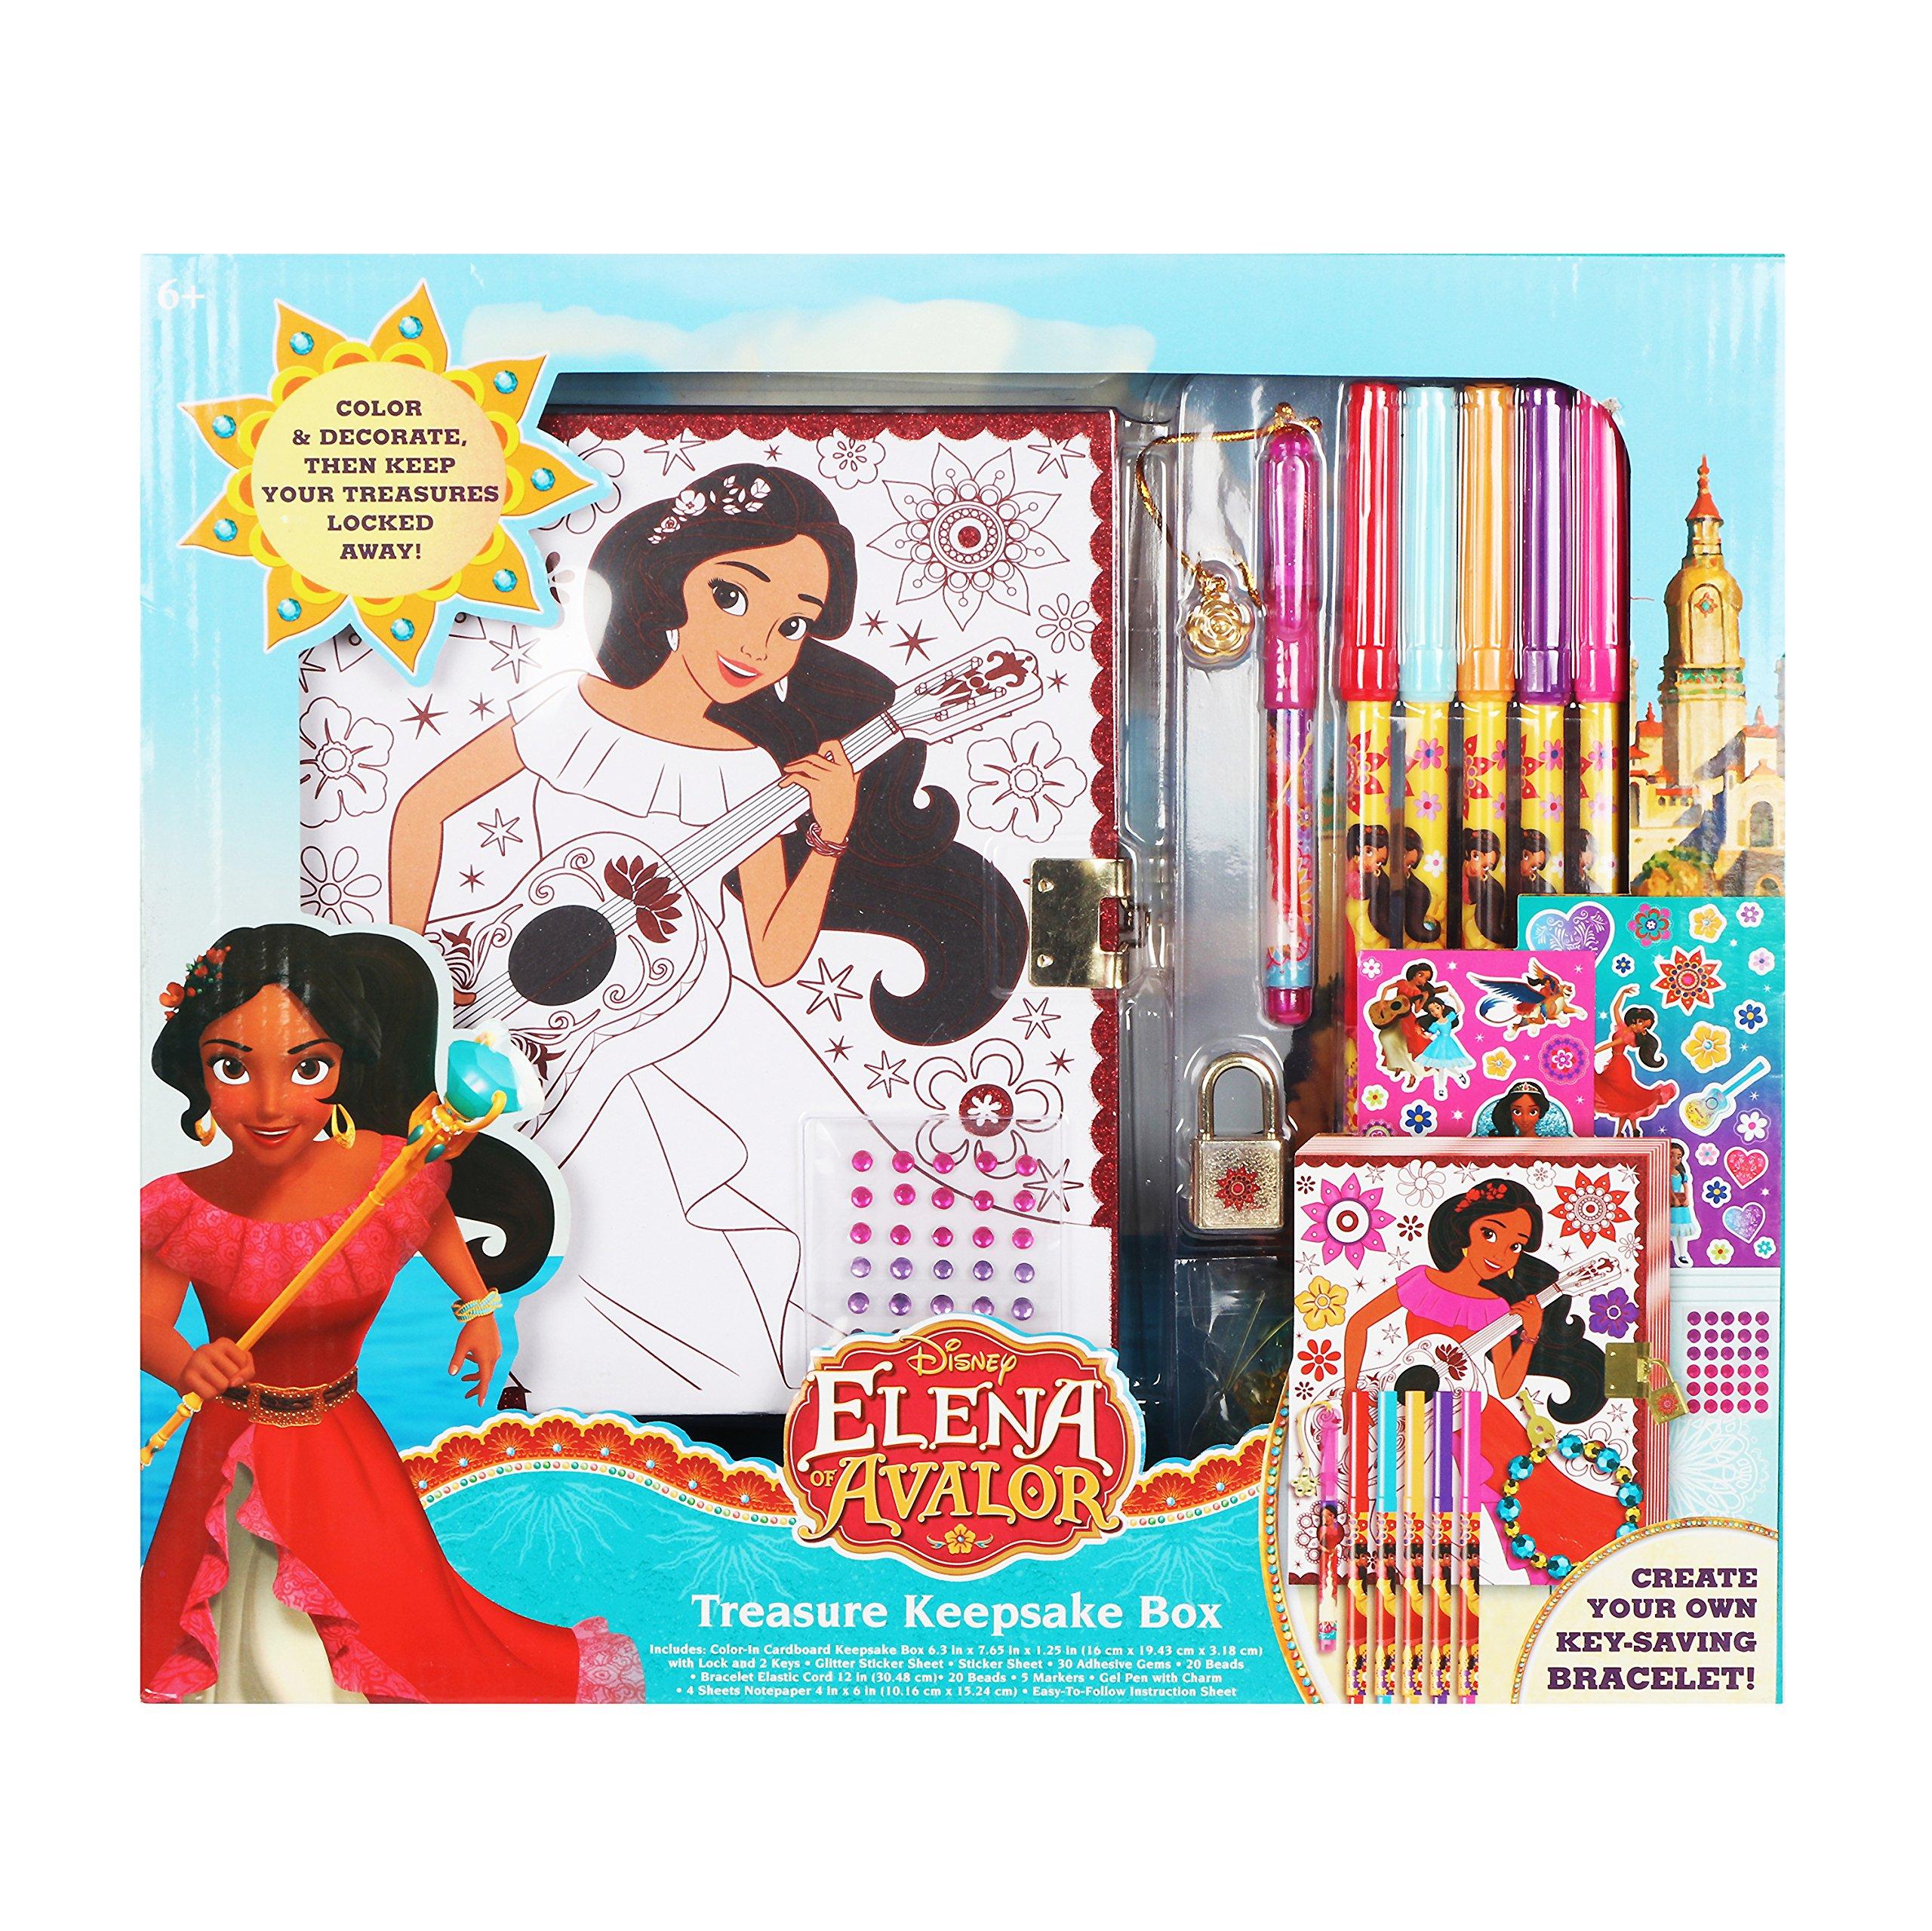 Disney Elena of Avalor Treasure Keepsake Box Set